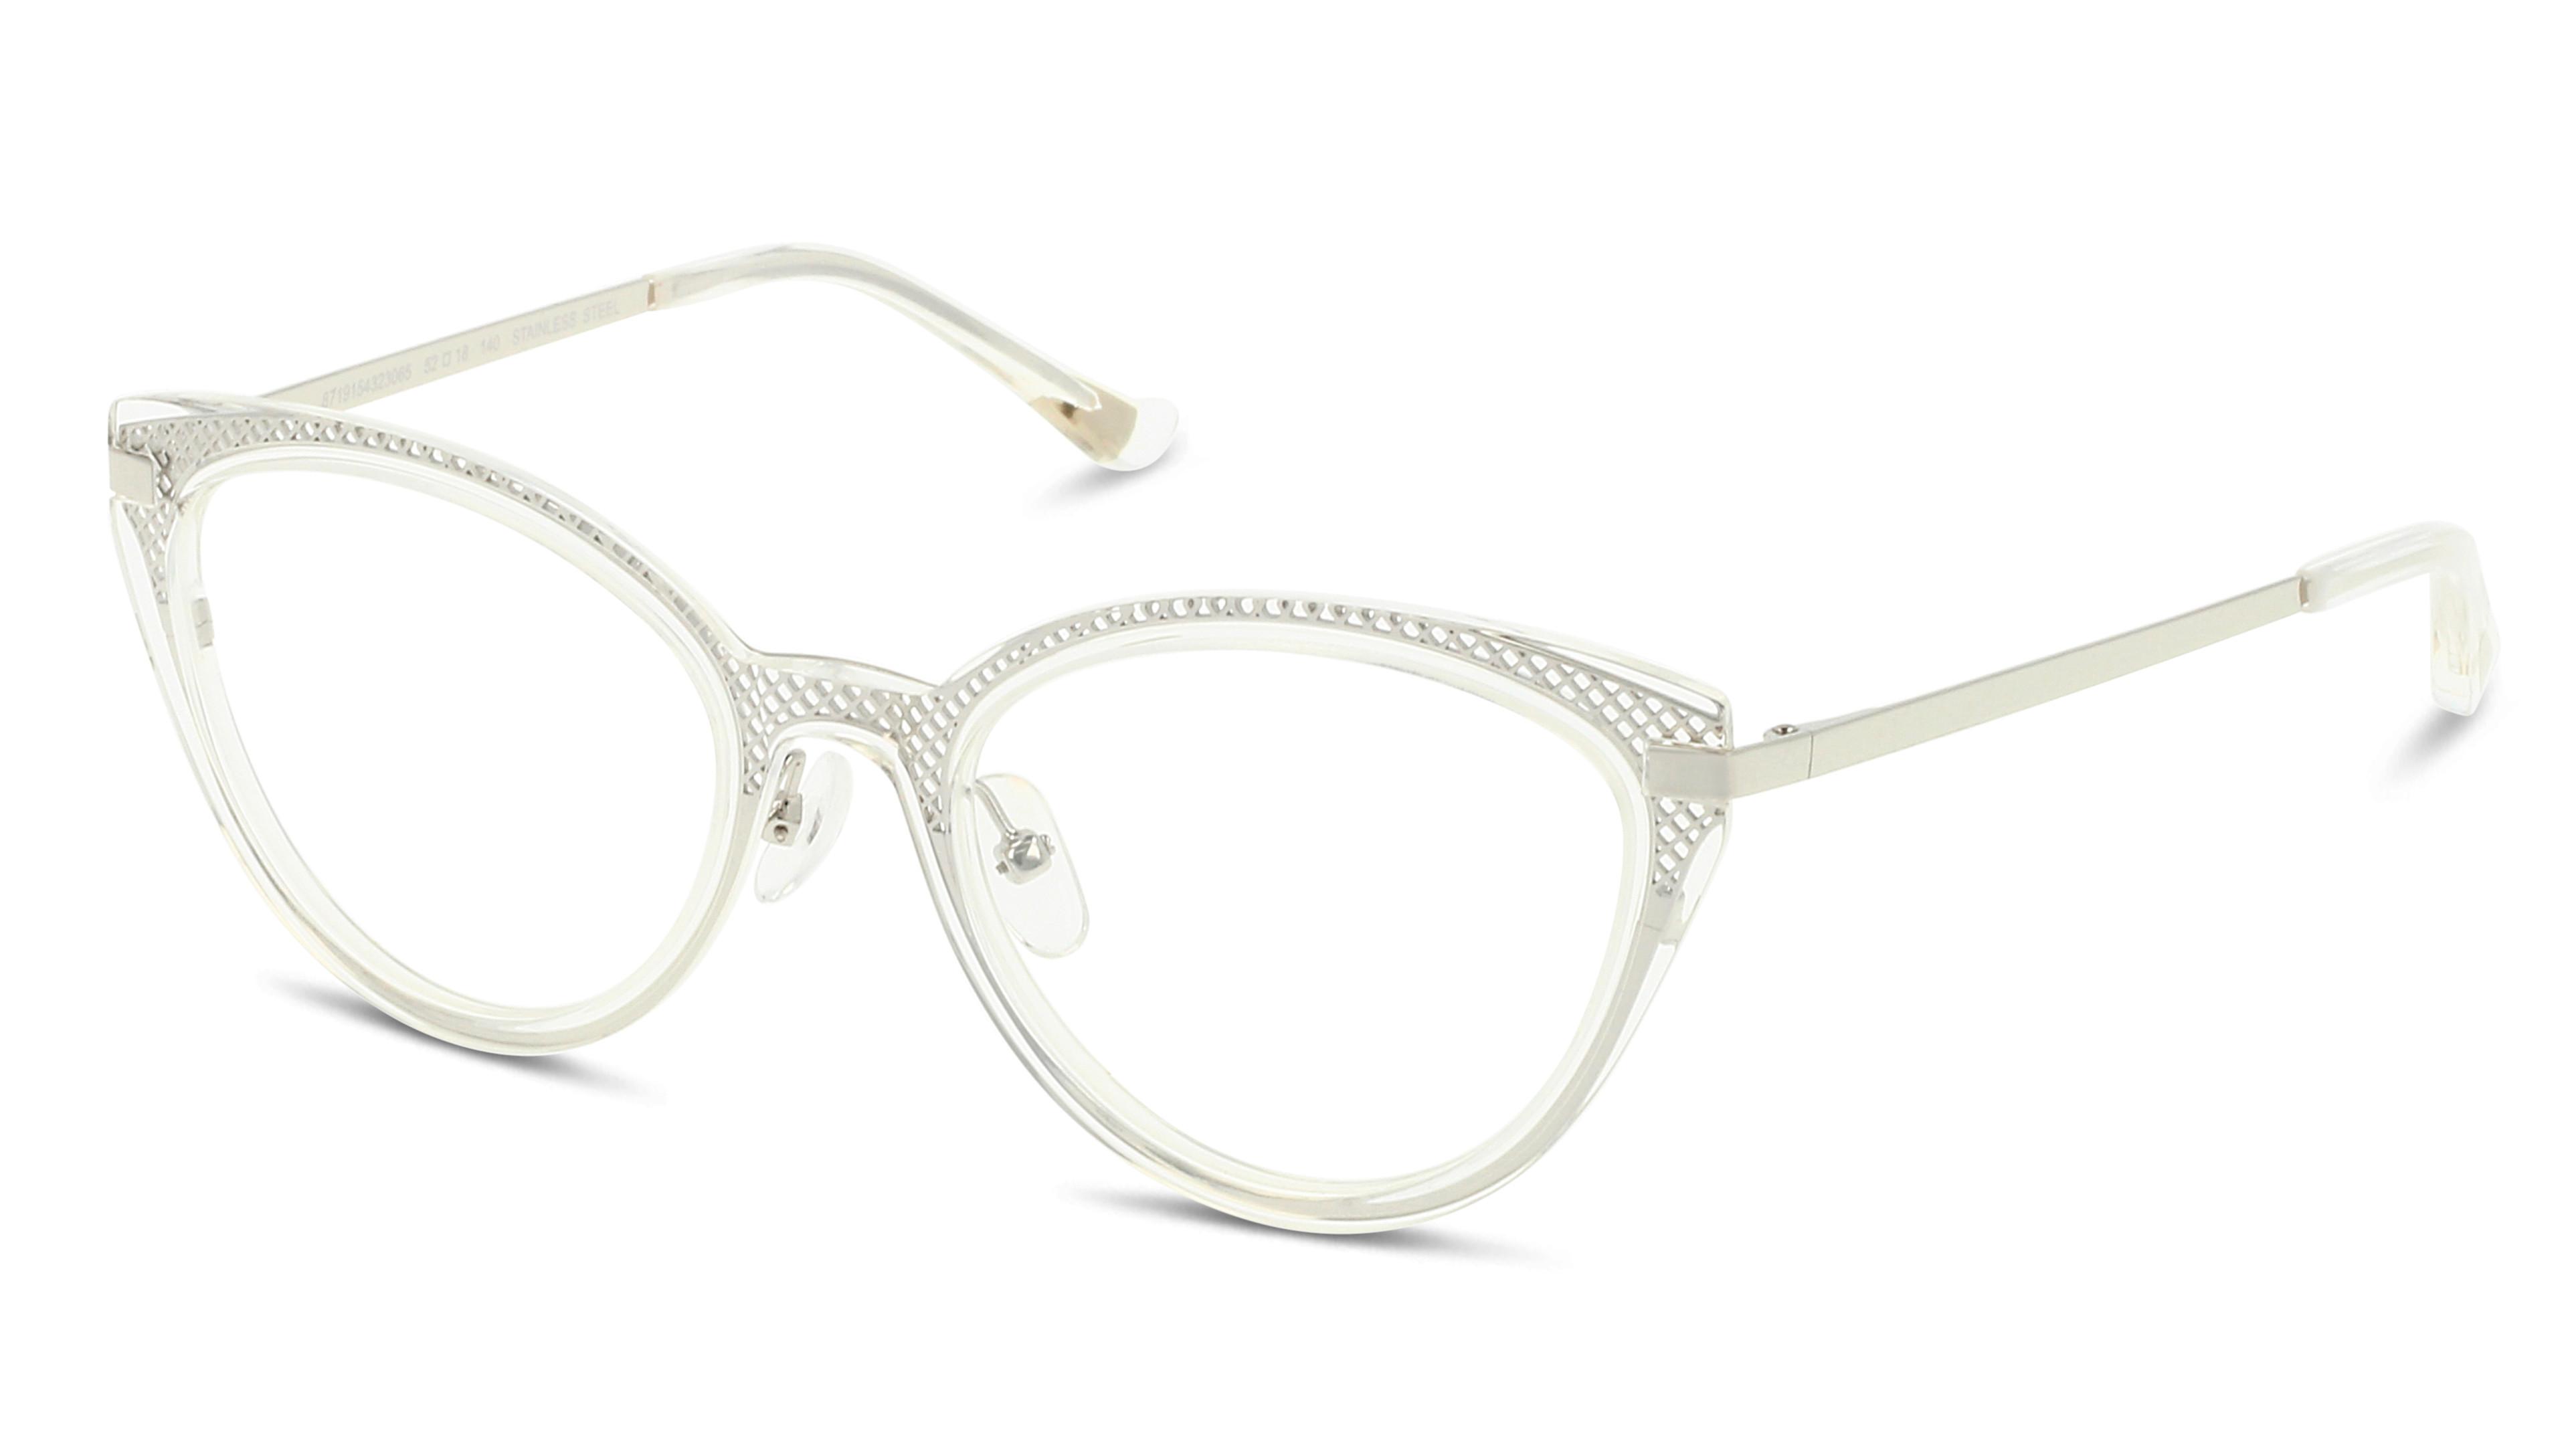 8719154621383-angle-03-fuzion-fuhf01-eyewear-other-silver